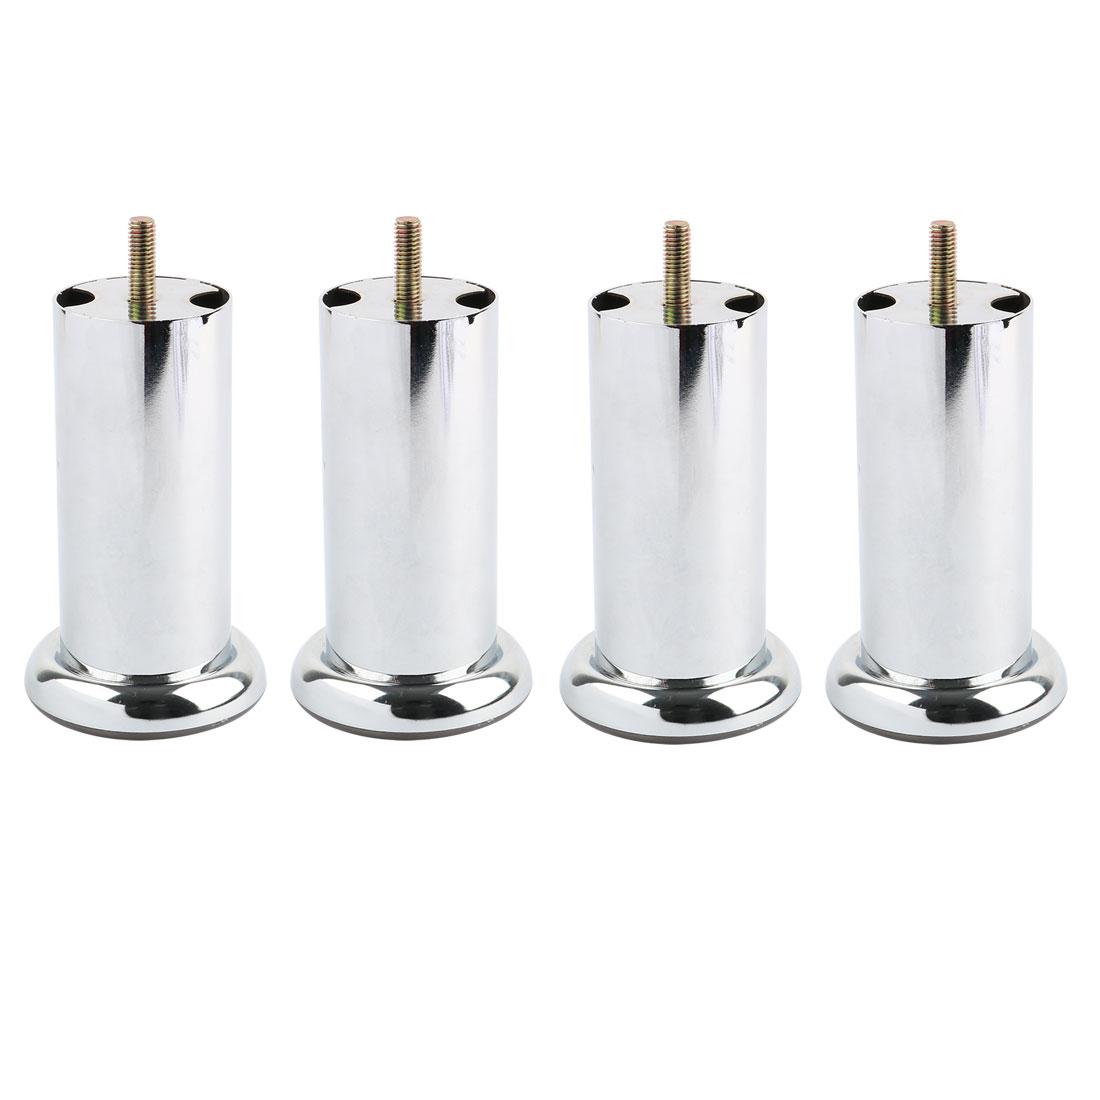 4pcs Metal Furniture Legs Cabinet Wardrobe Sofa Desk Table Bed Feet 70 x 120mm